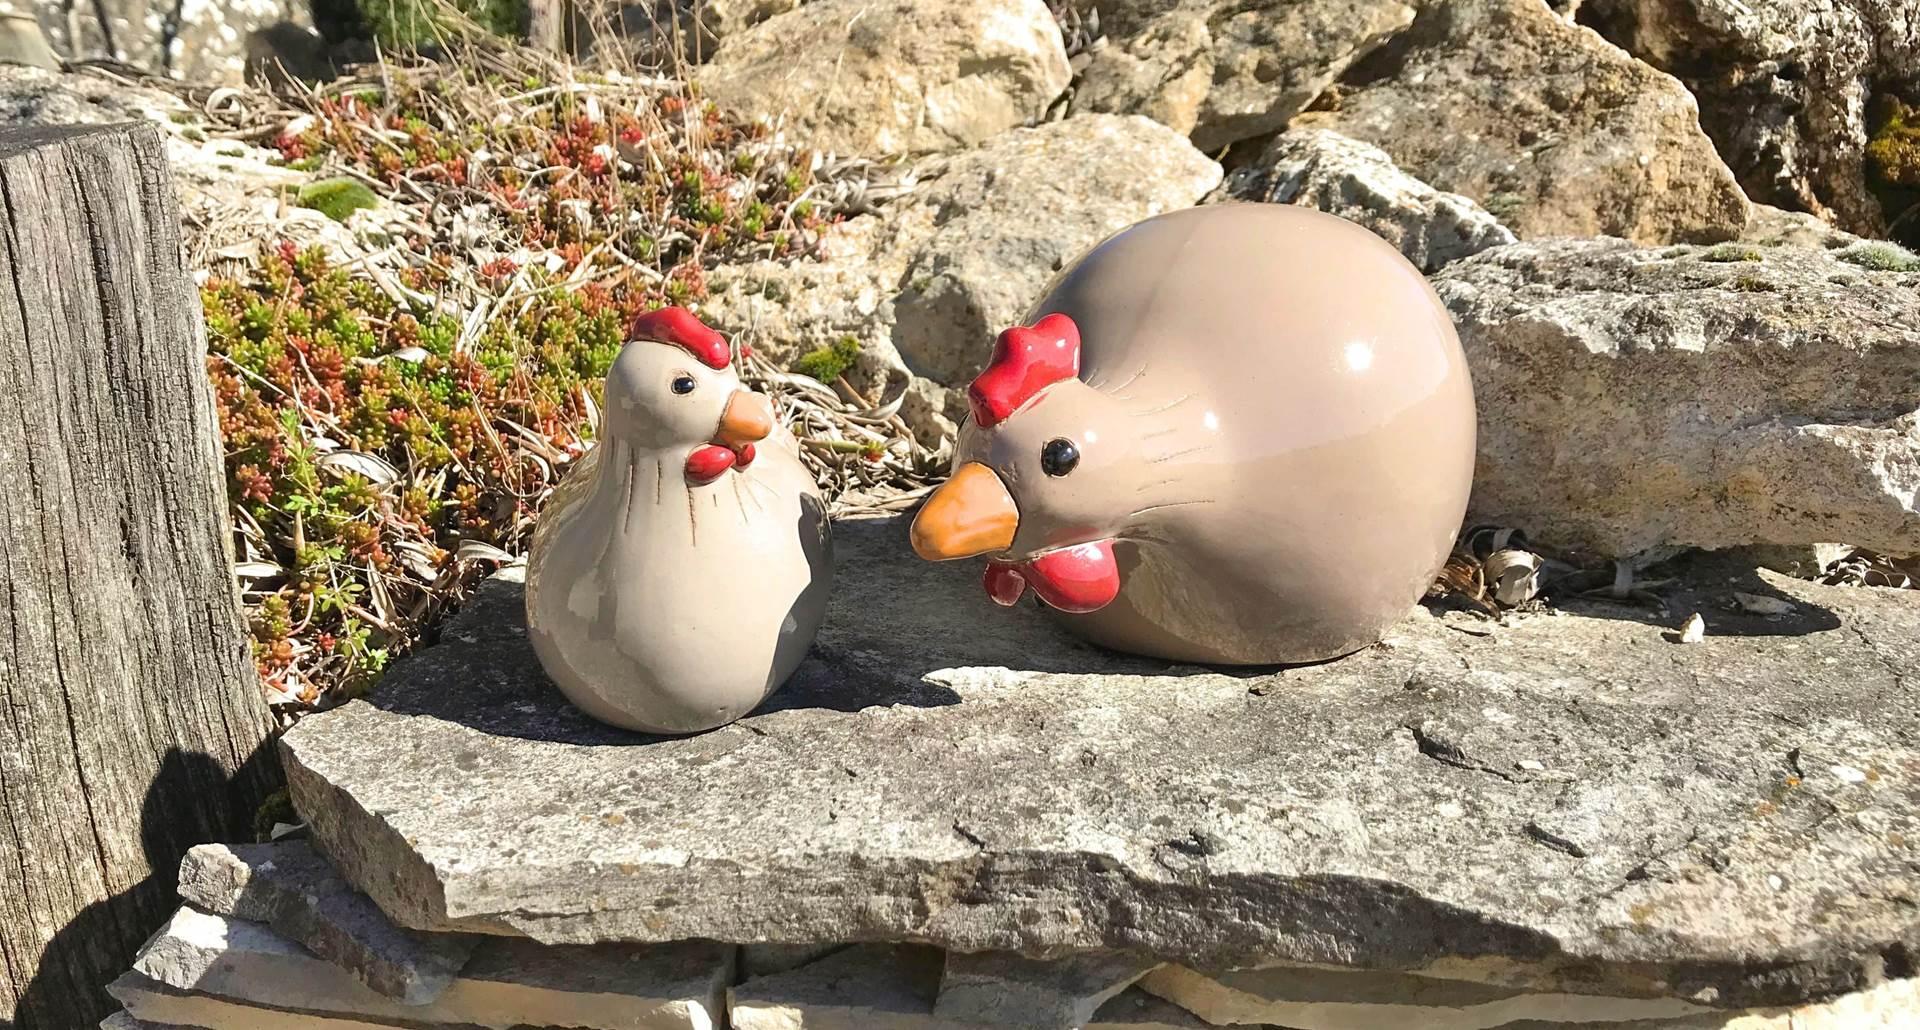 Les mascottes de Côtés Granges